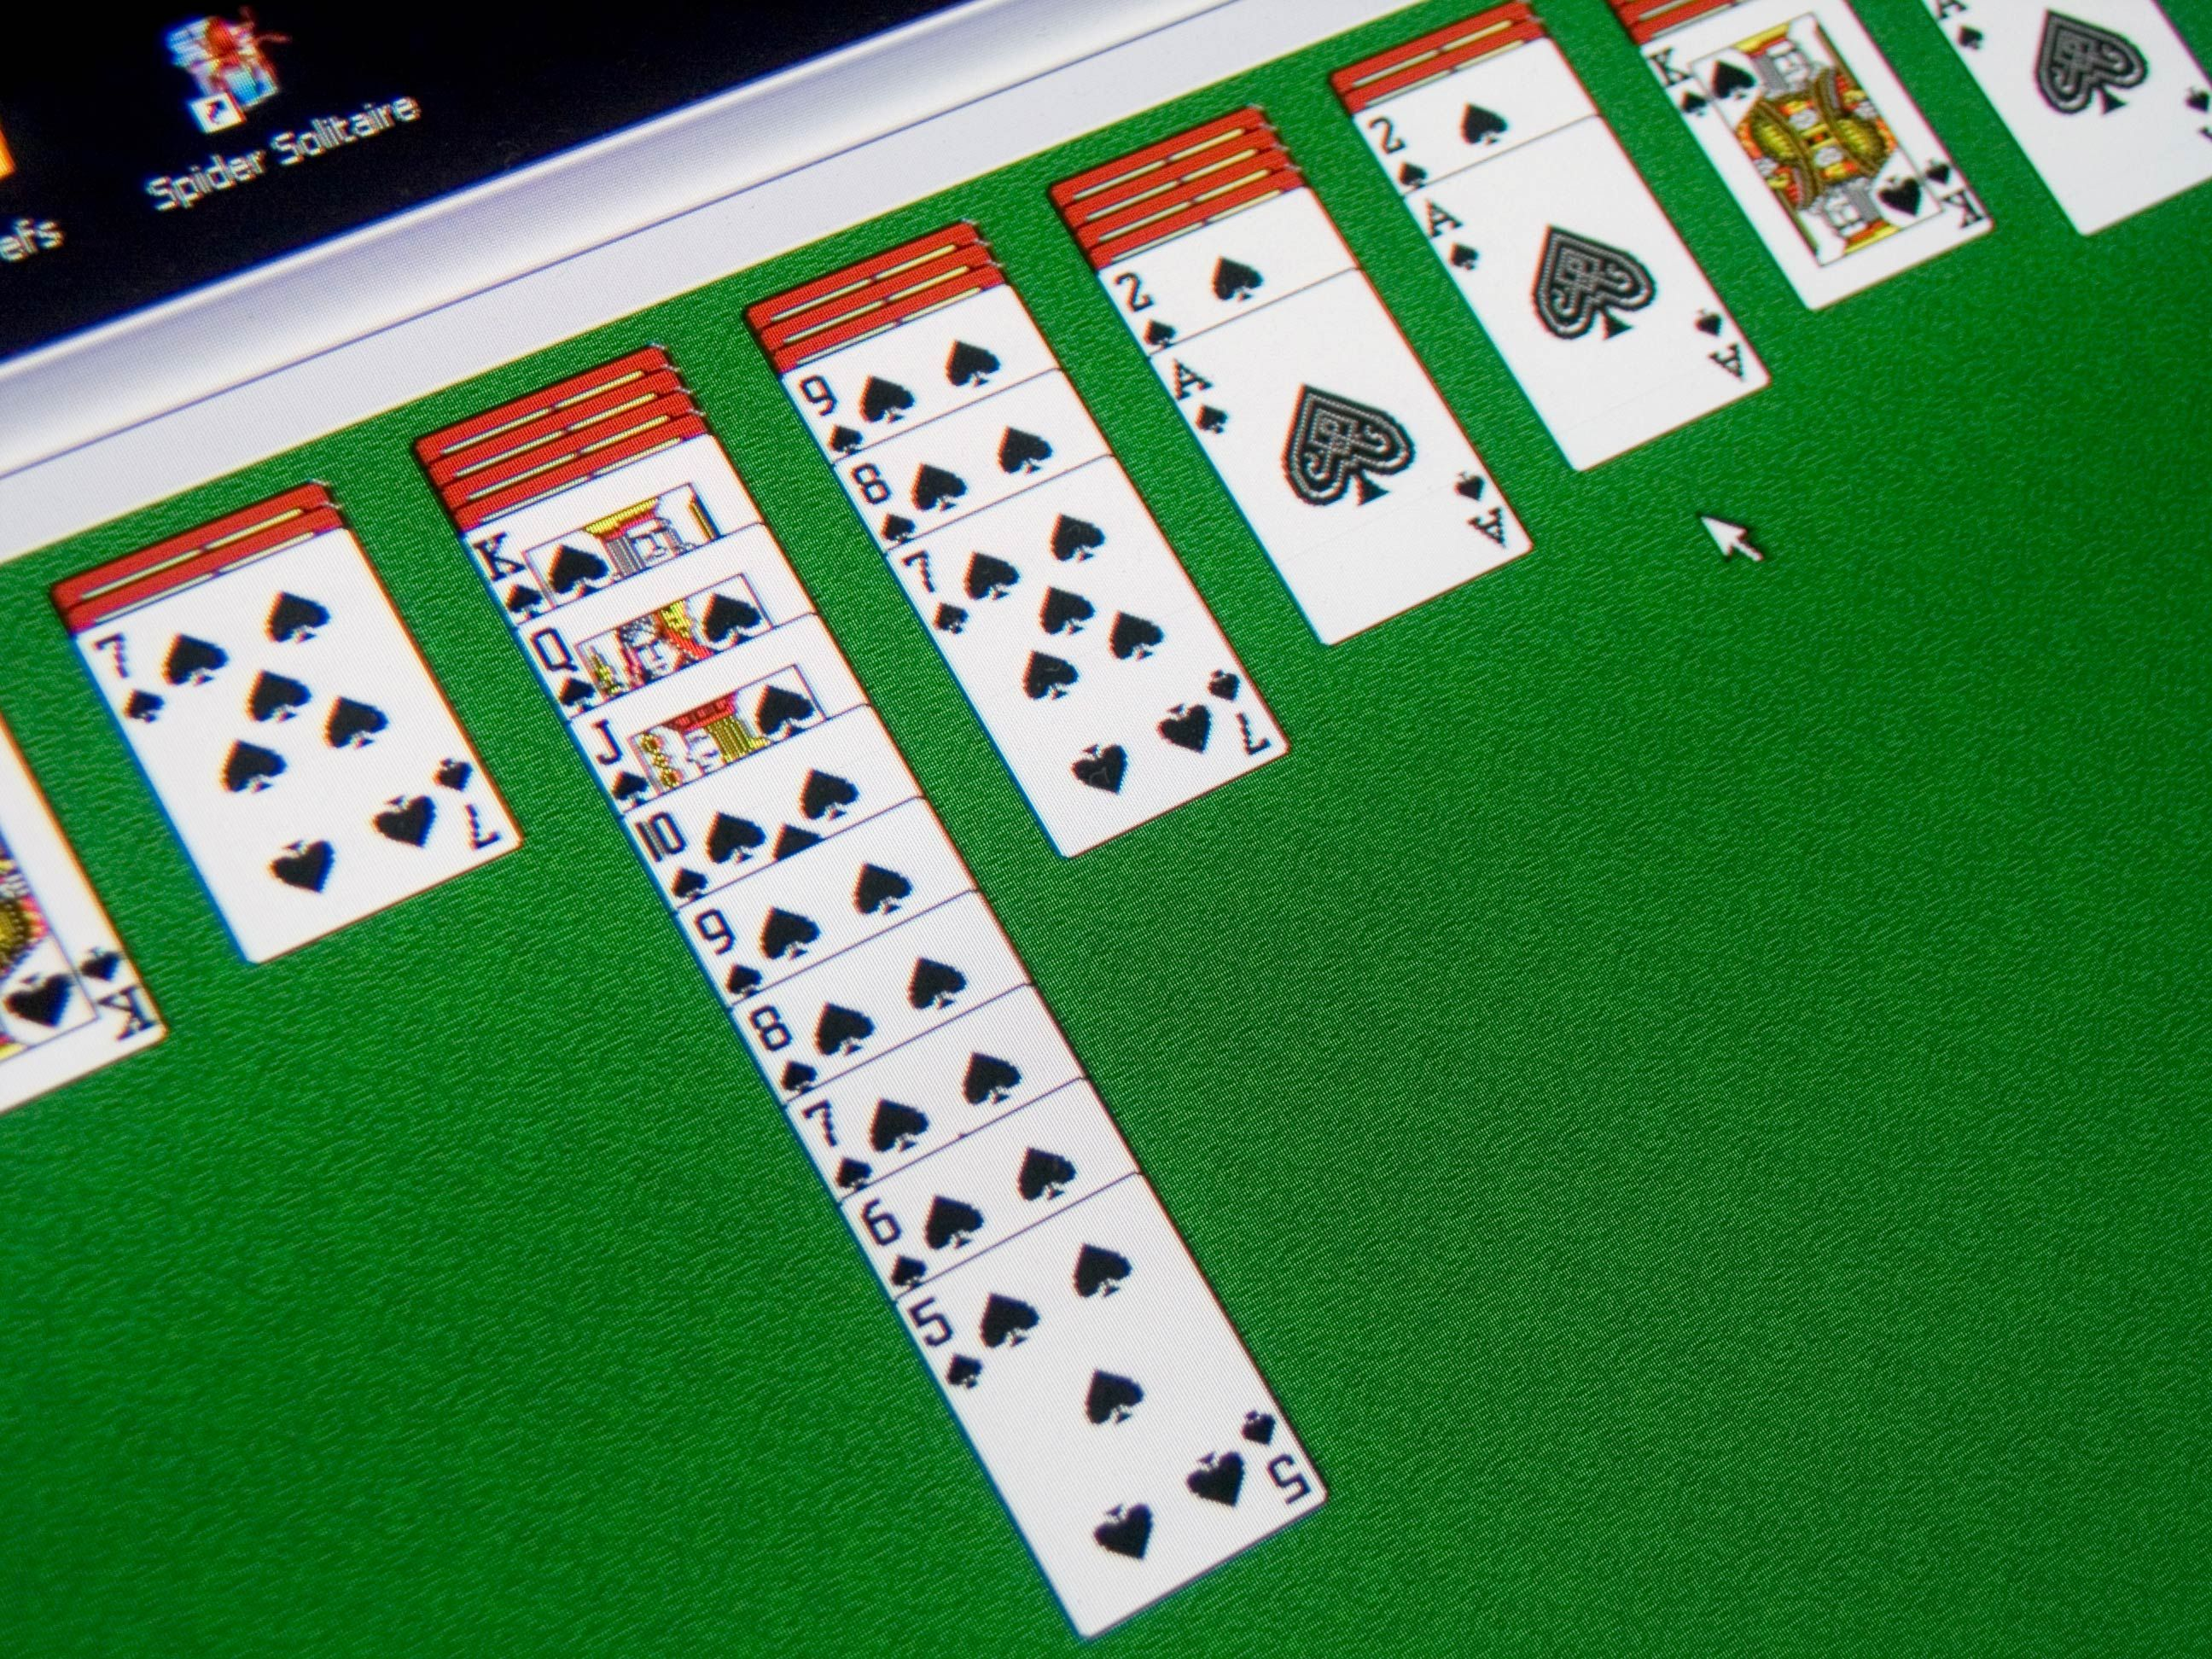 Solitaire Cartes Cards Jeuxdecartes Cardsgame Jeu Game